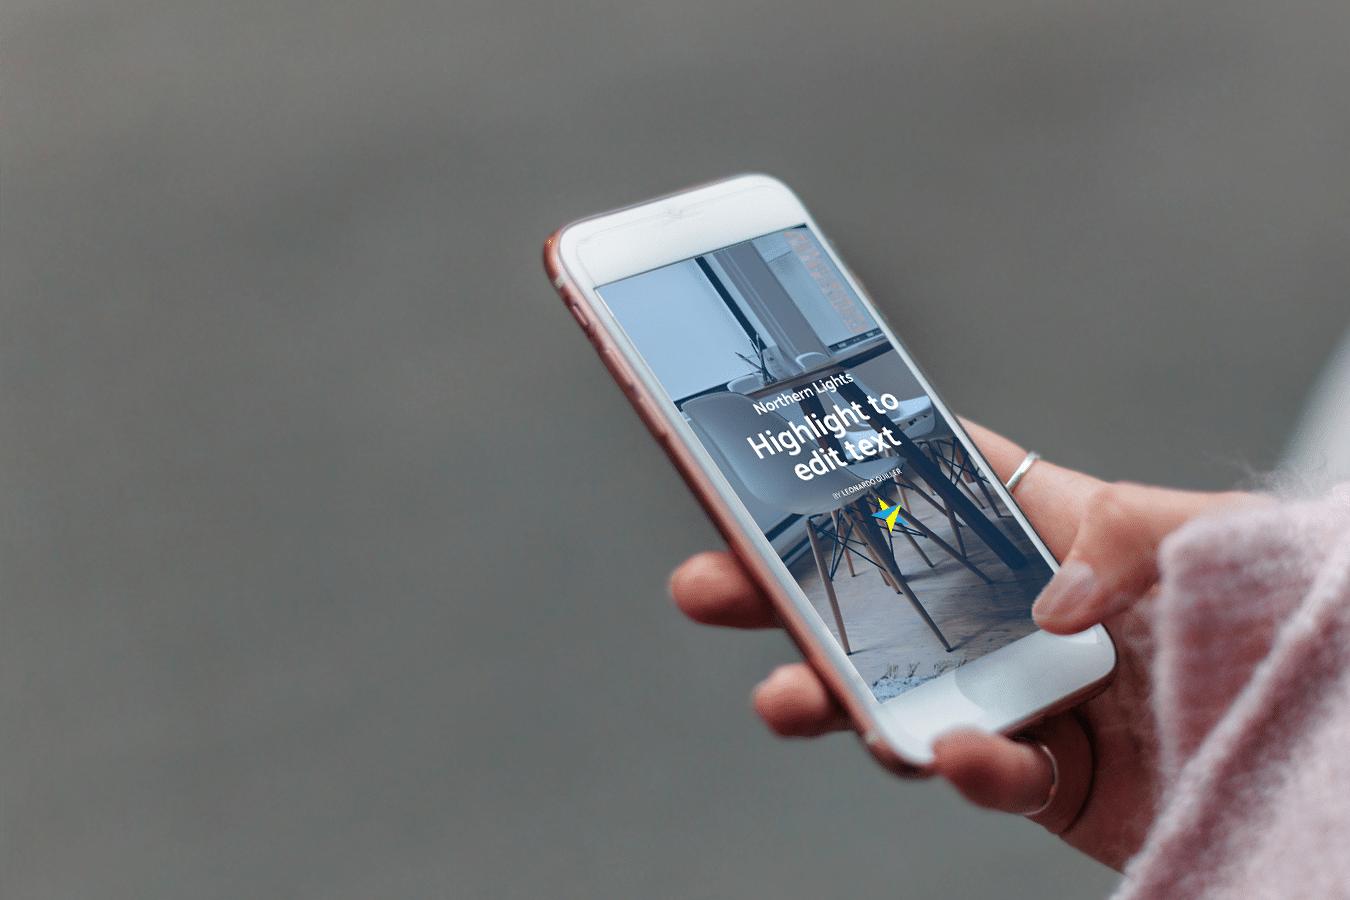 interior-design-proposal-template-mobile